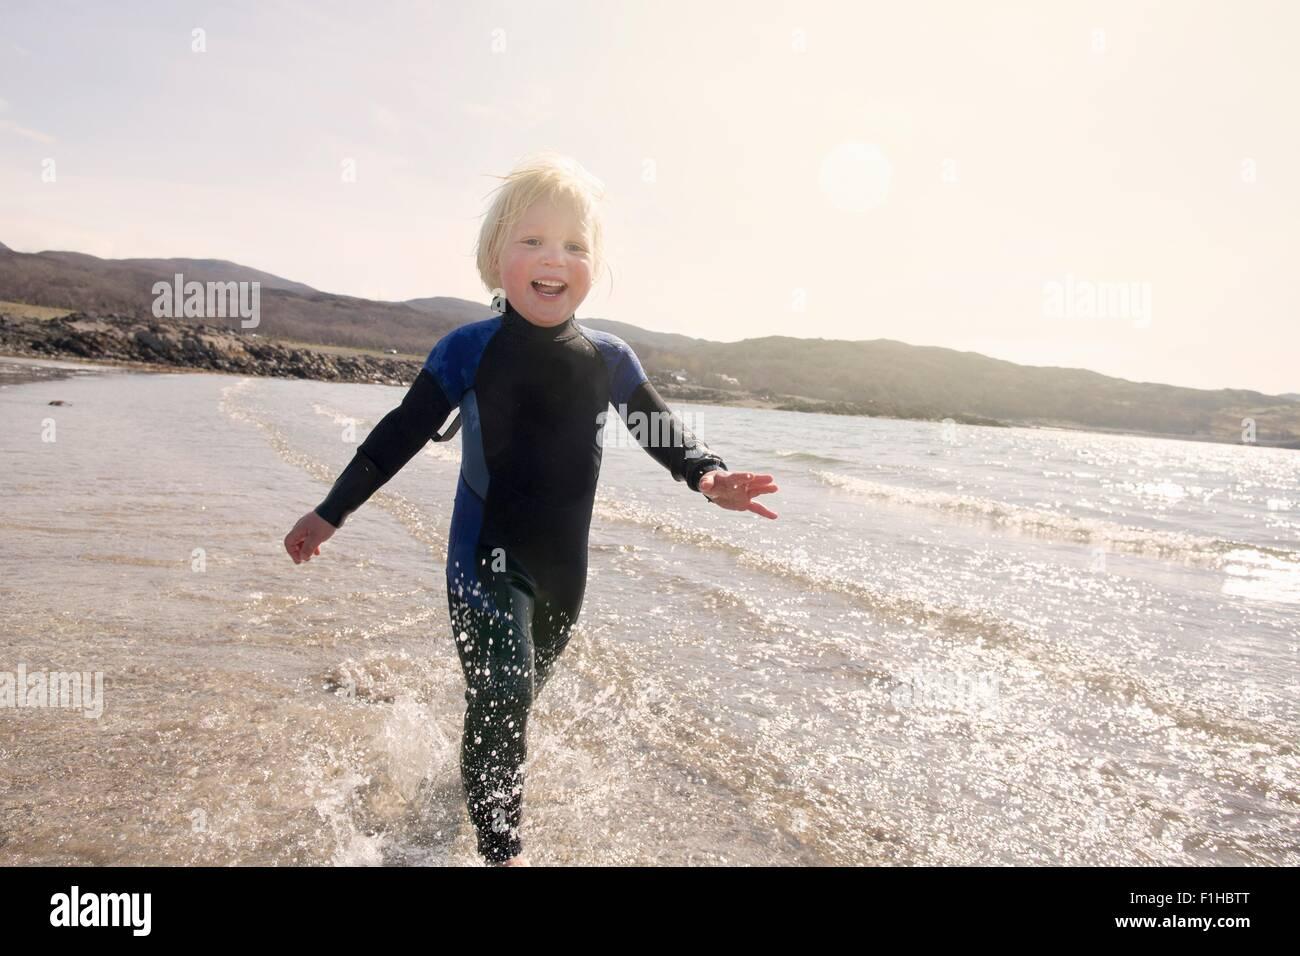 Boy running on beach, Loch Eishort, Isle of Skye, Hebrides, Scotland - Stock Image